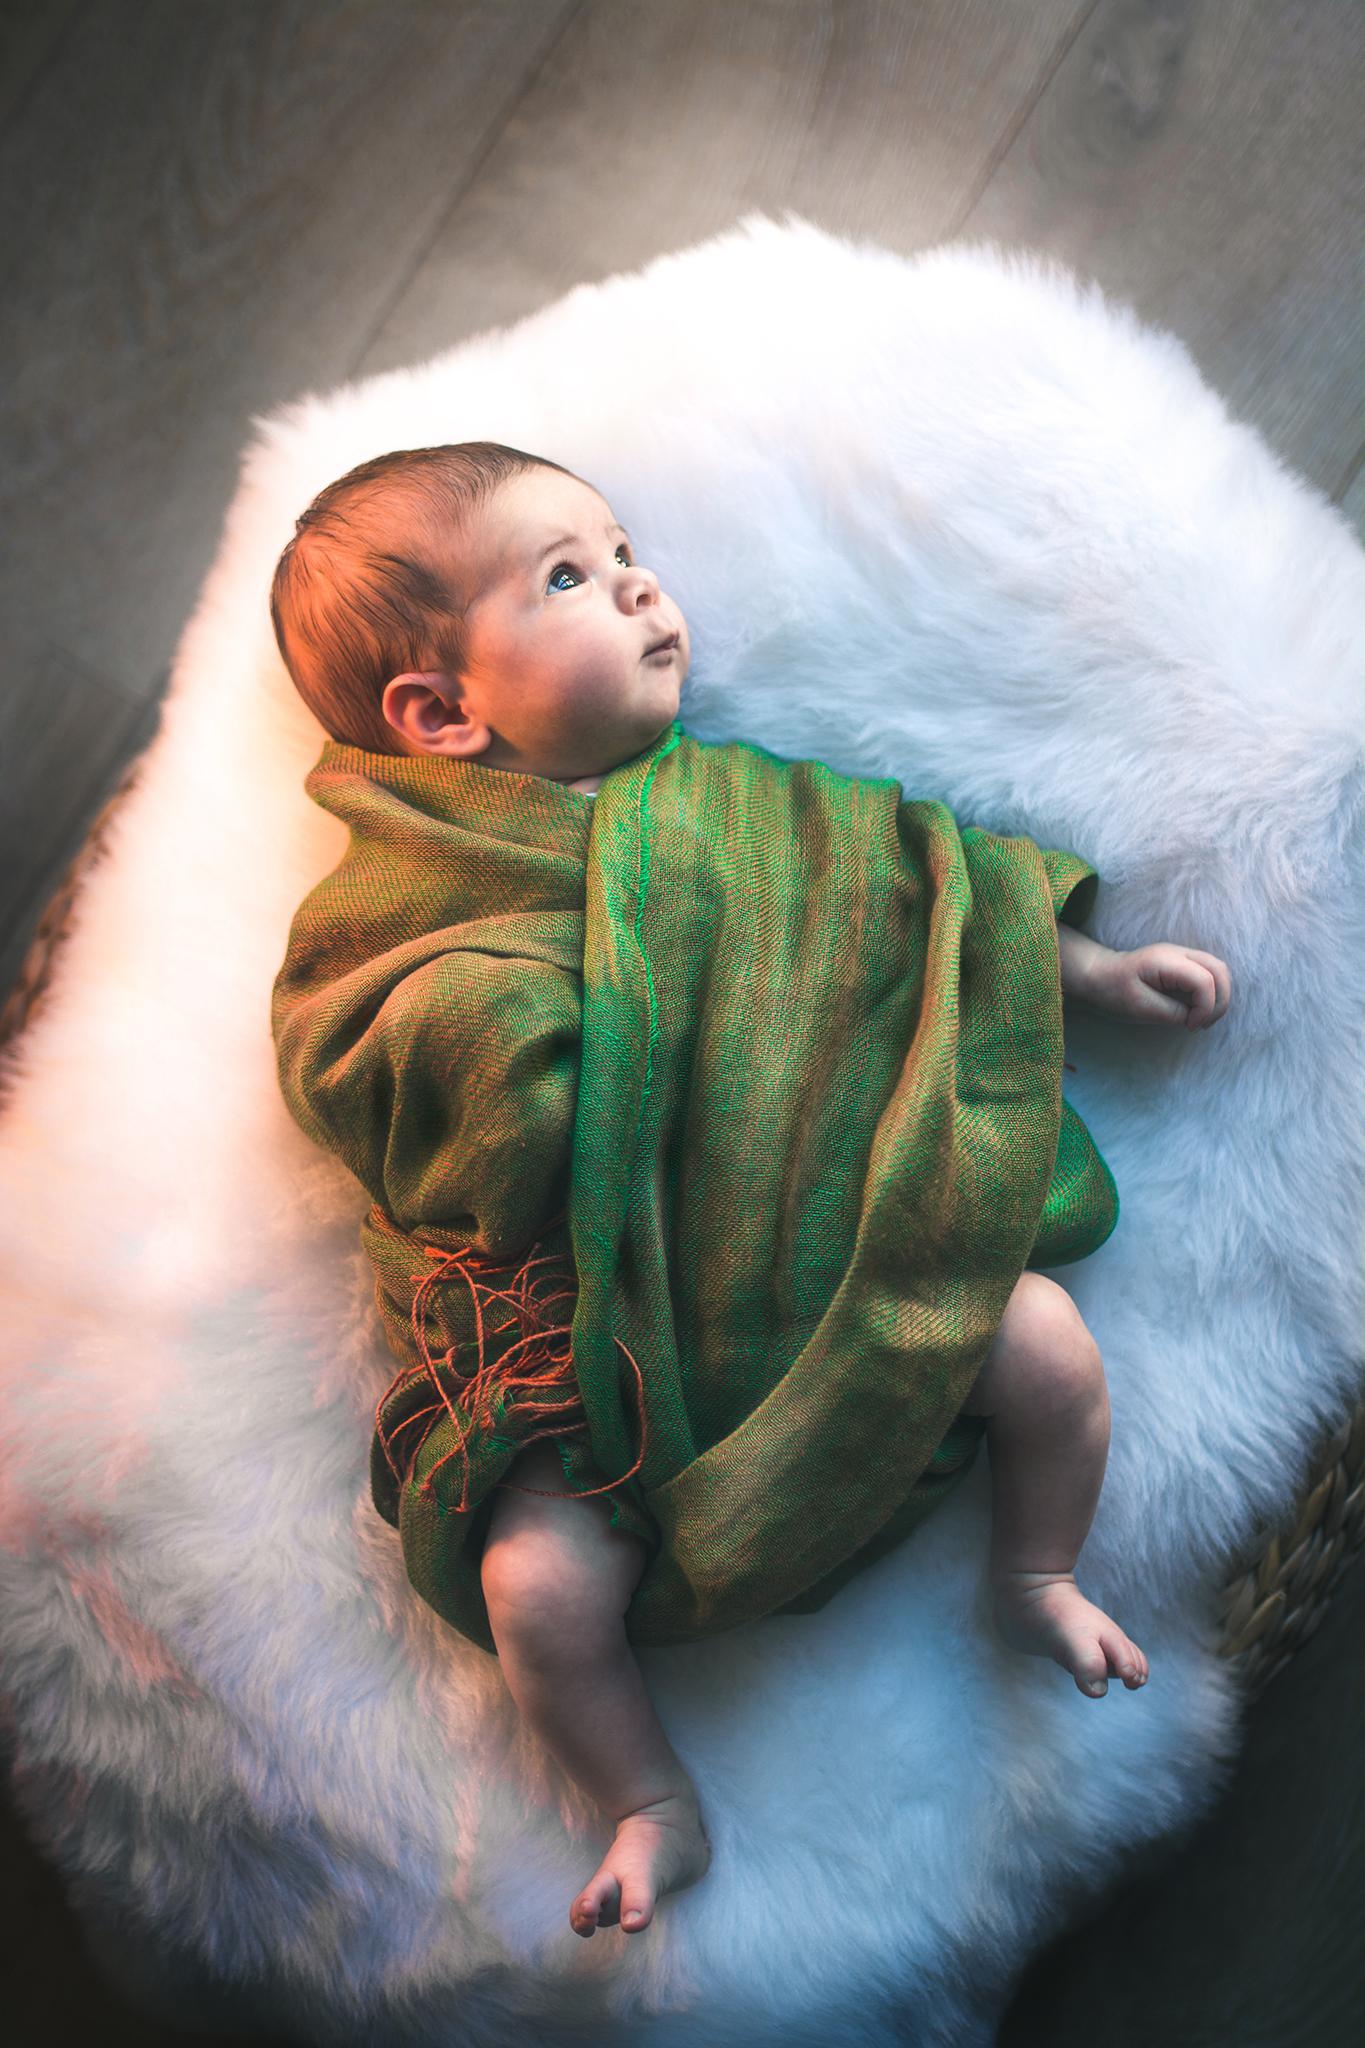 newborn-maternity-wedding-portrait-photography-bedfordshire-dunstable-london (9).jpg